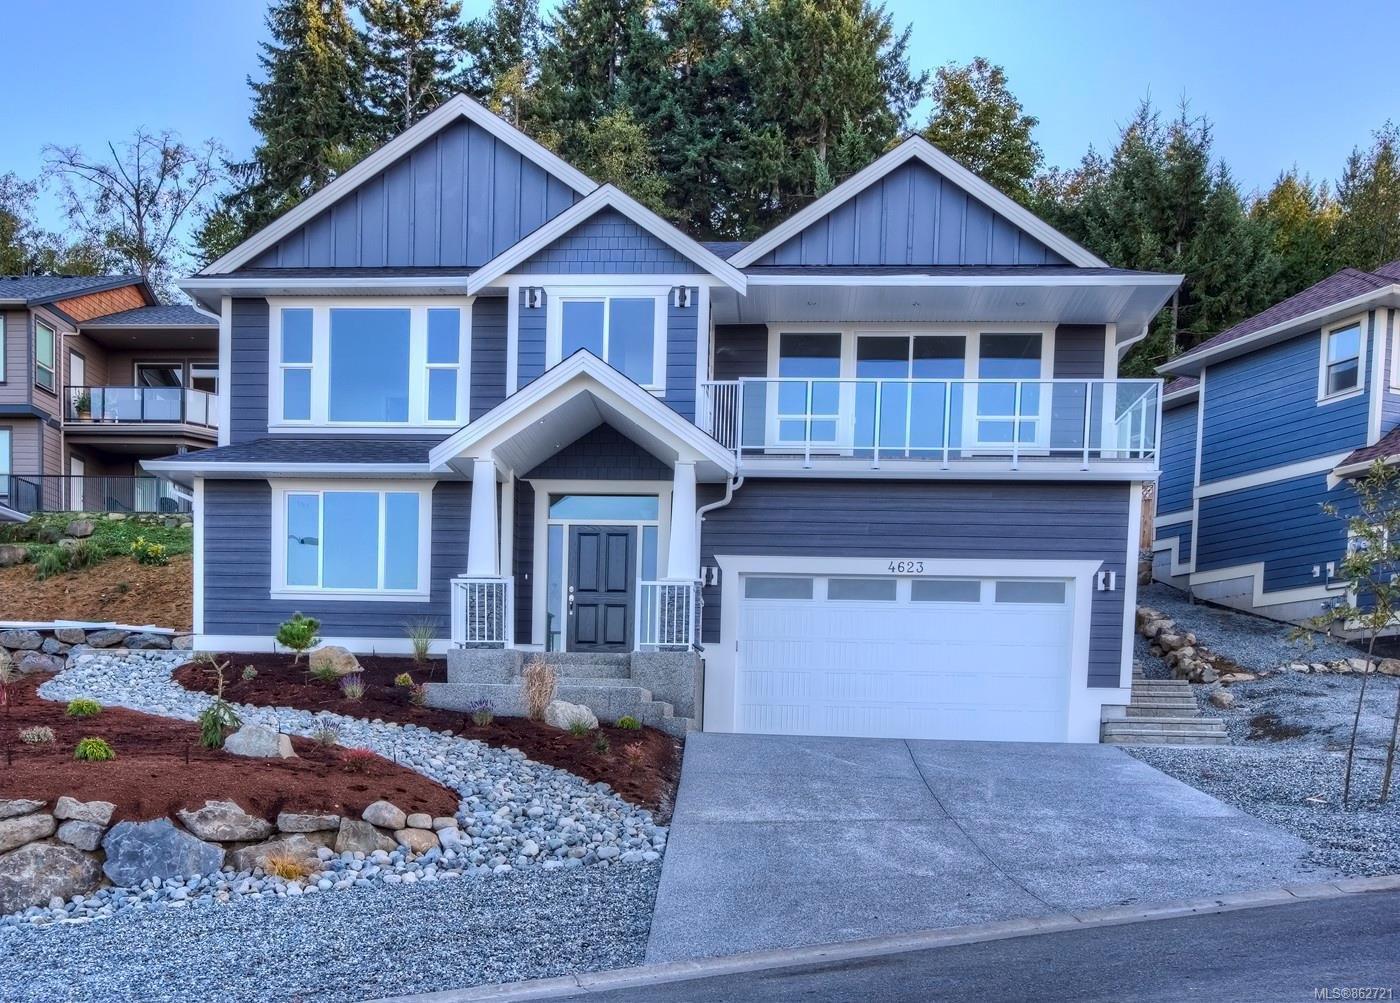 Main Photo: 4623 Sheridan Ridge Rd in : Na North Nanaimo House for sale (Nanaimo)  : MLS®# 862721